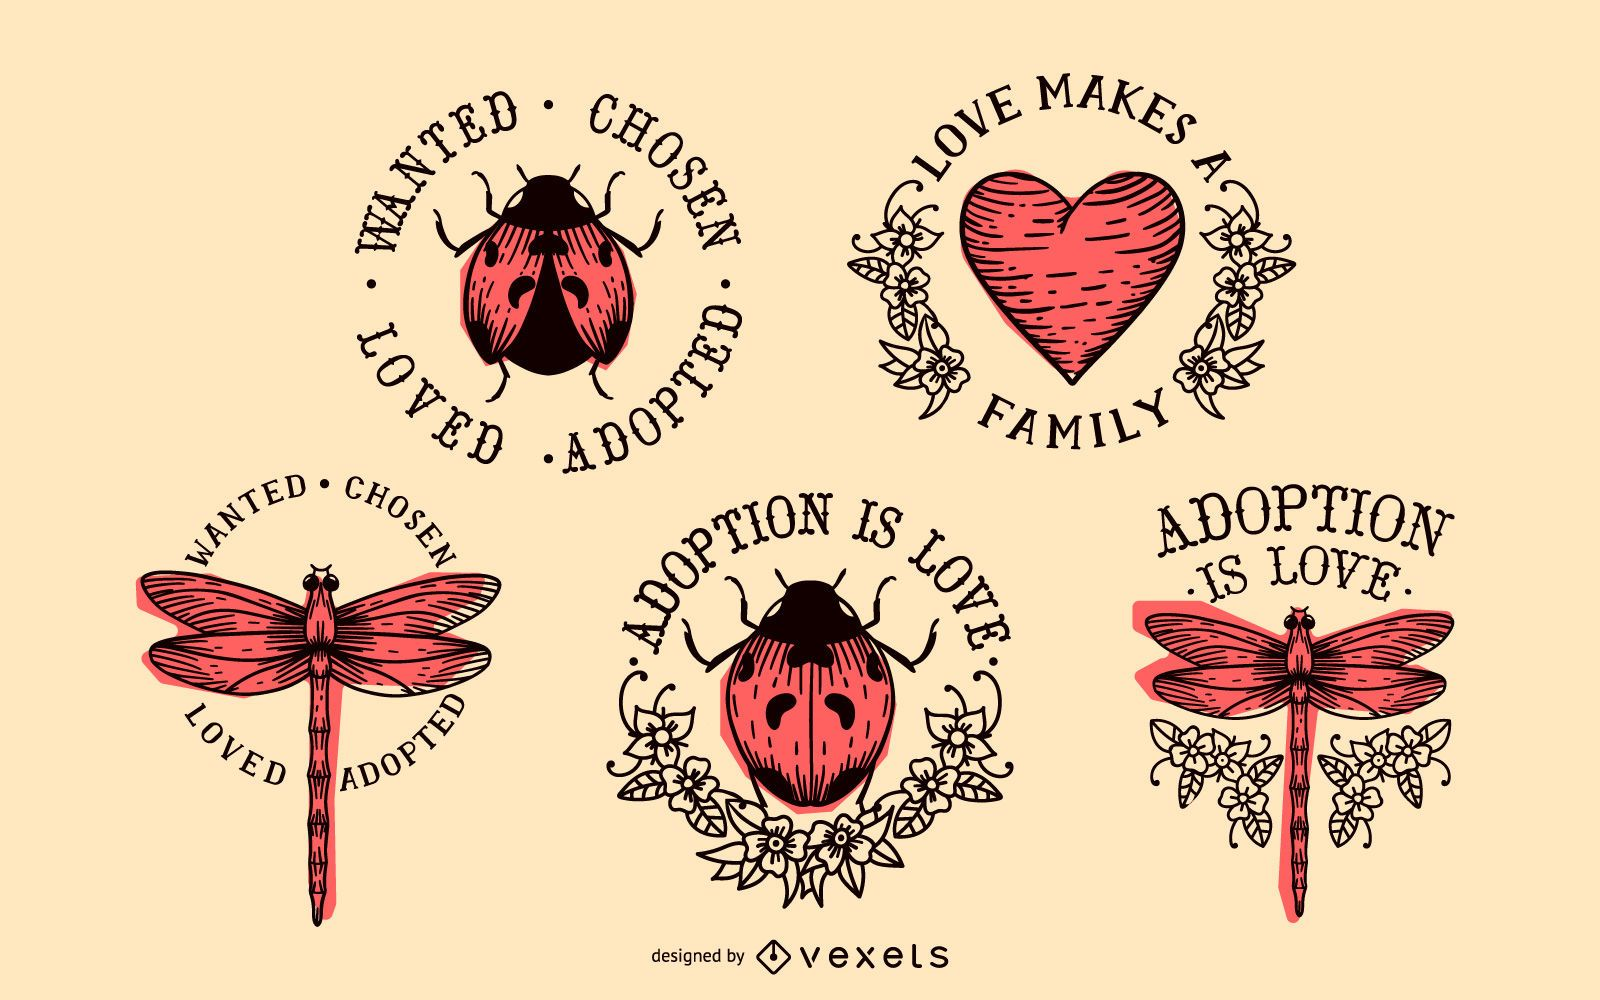 Adoption badge pack